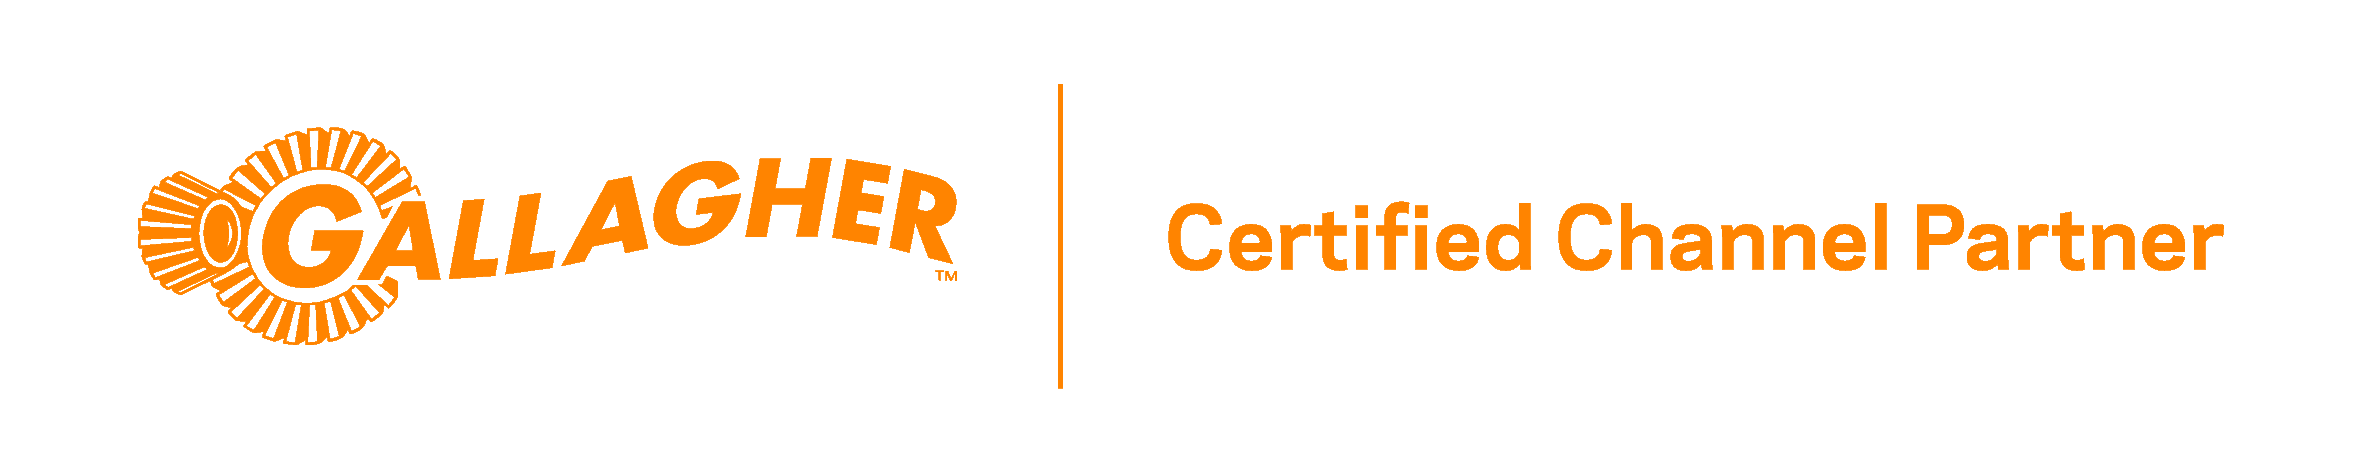 Gallagher CCP - Horizontal - Screen - Orange